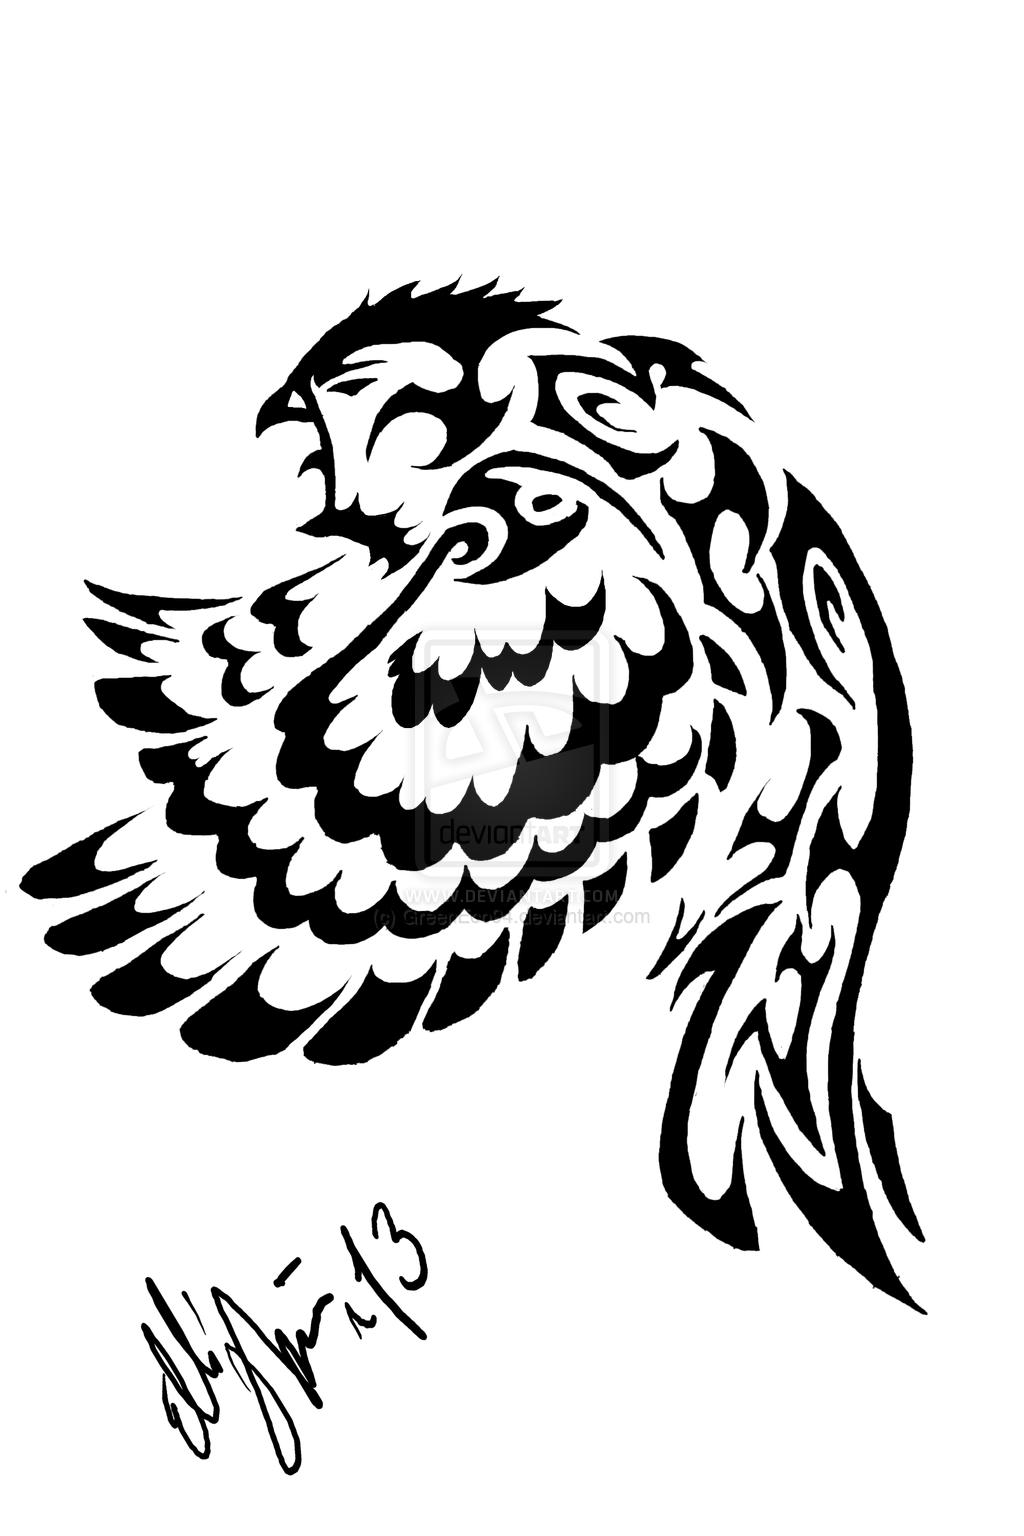 Tribal Owl Tattoo Tribal Owl Tattoo Desing By Greeneco94 Owl